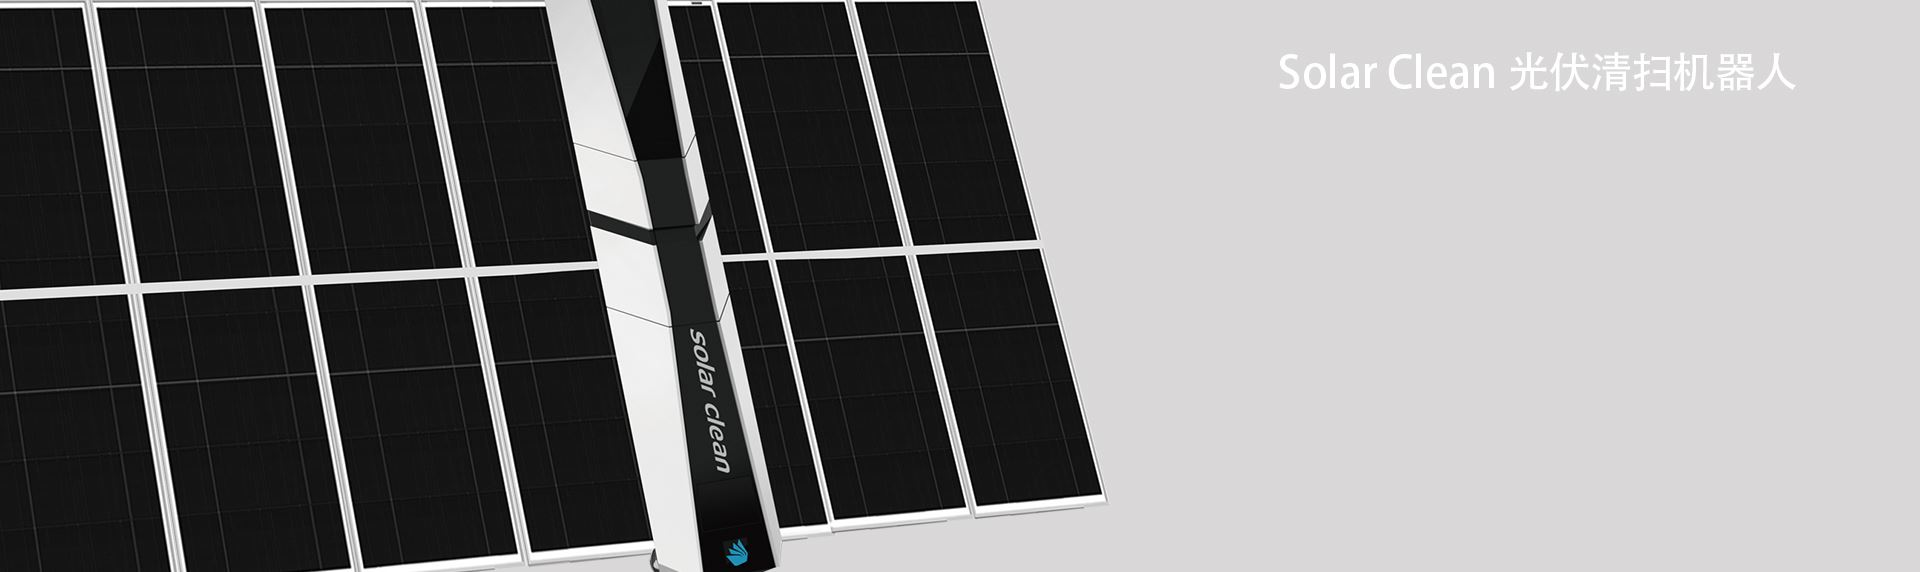 SSC设计-Solar Clean 光伏清扫机器人